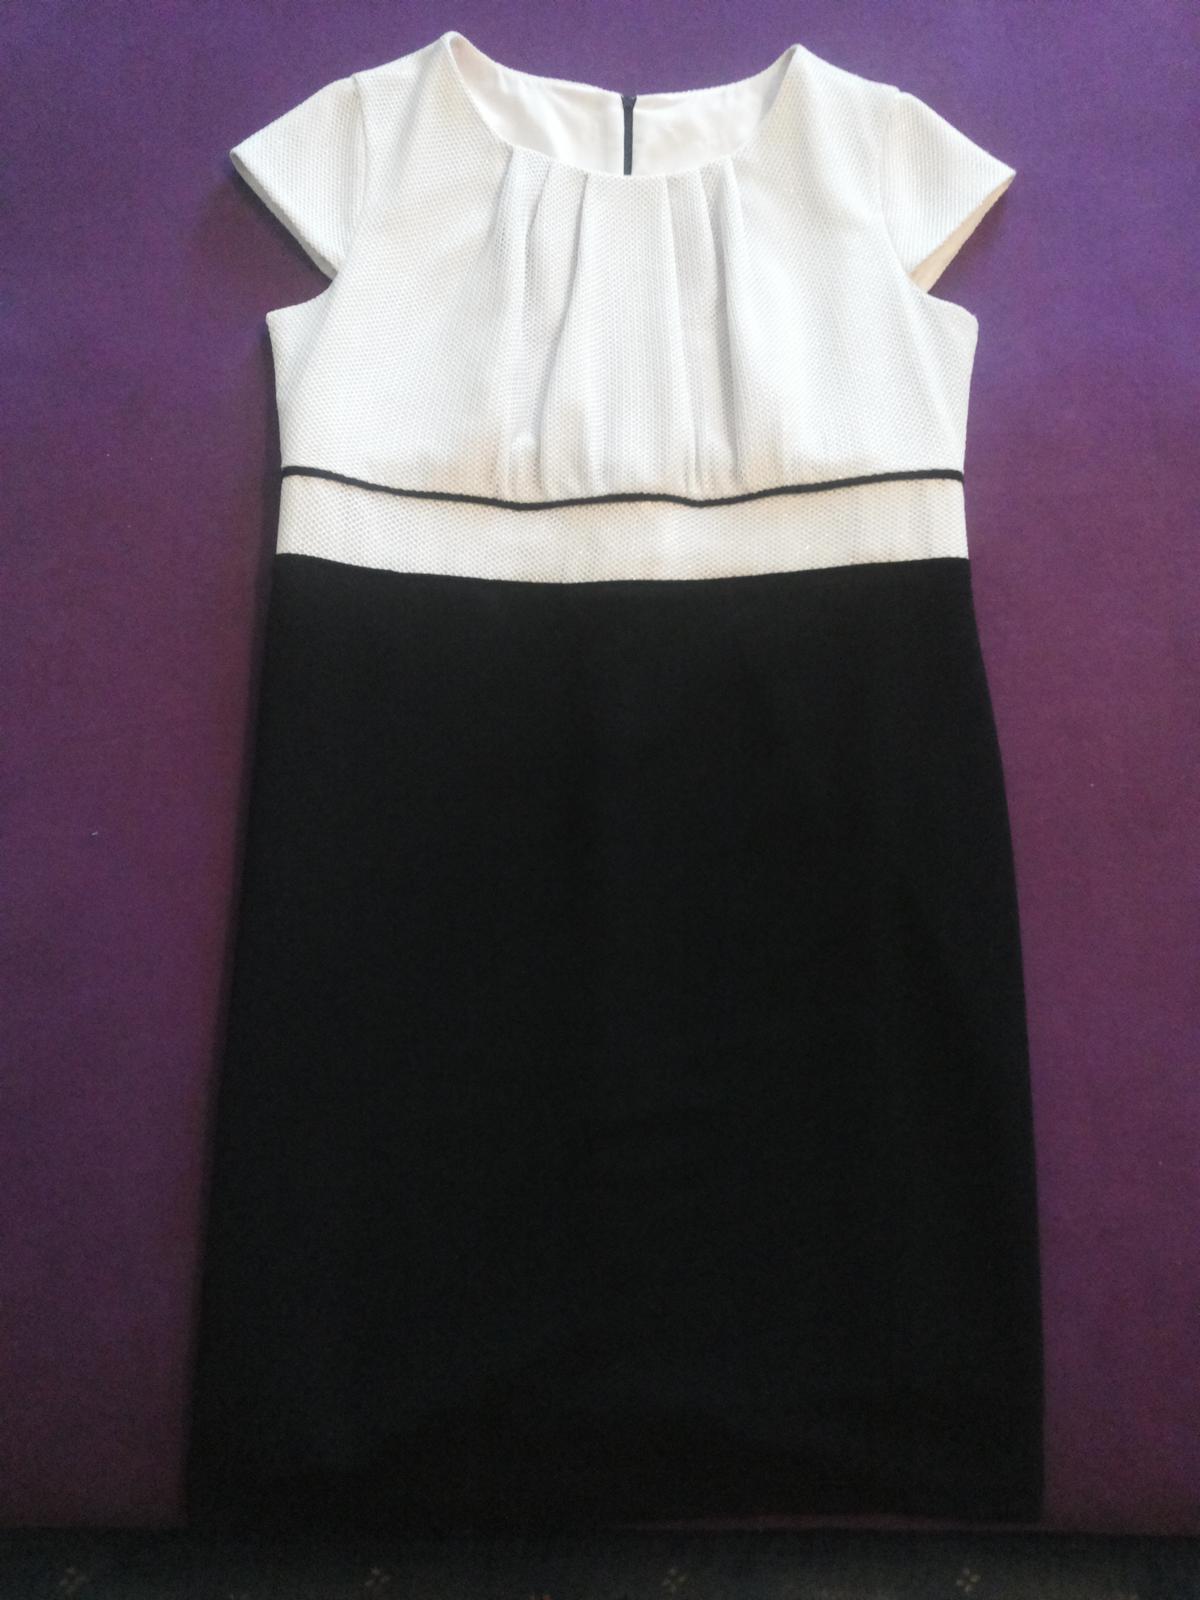 Béžové krátke šaty - Obrázok č. 2